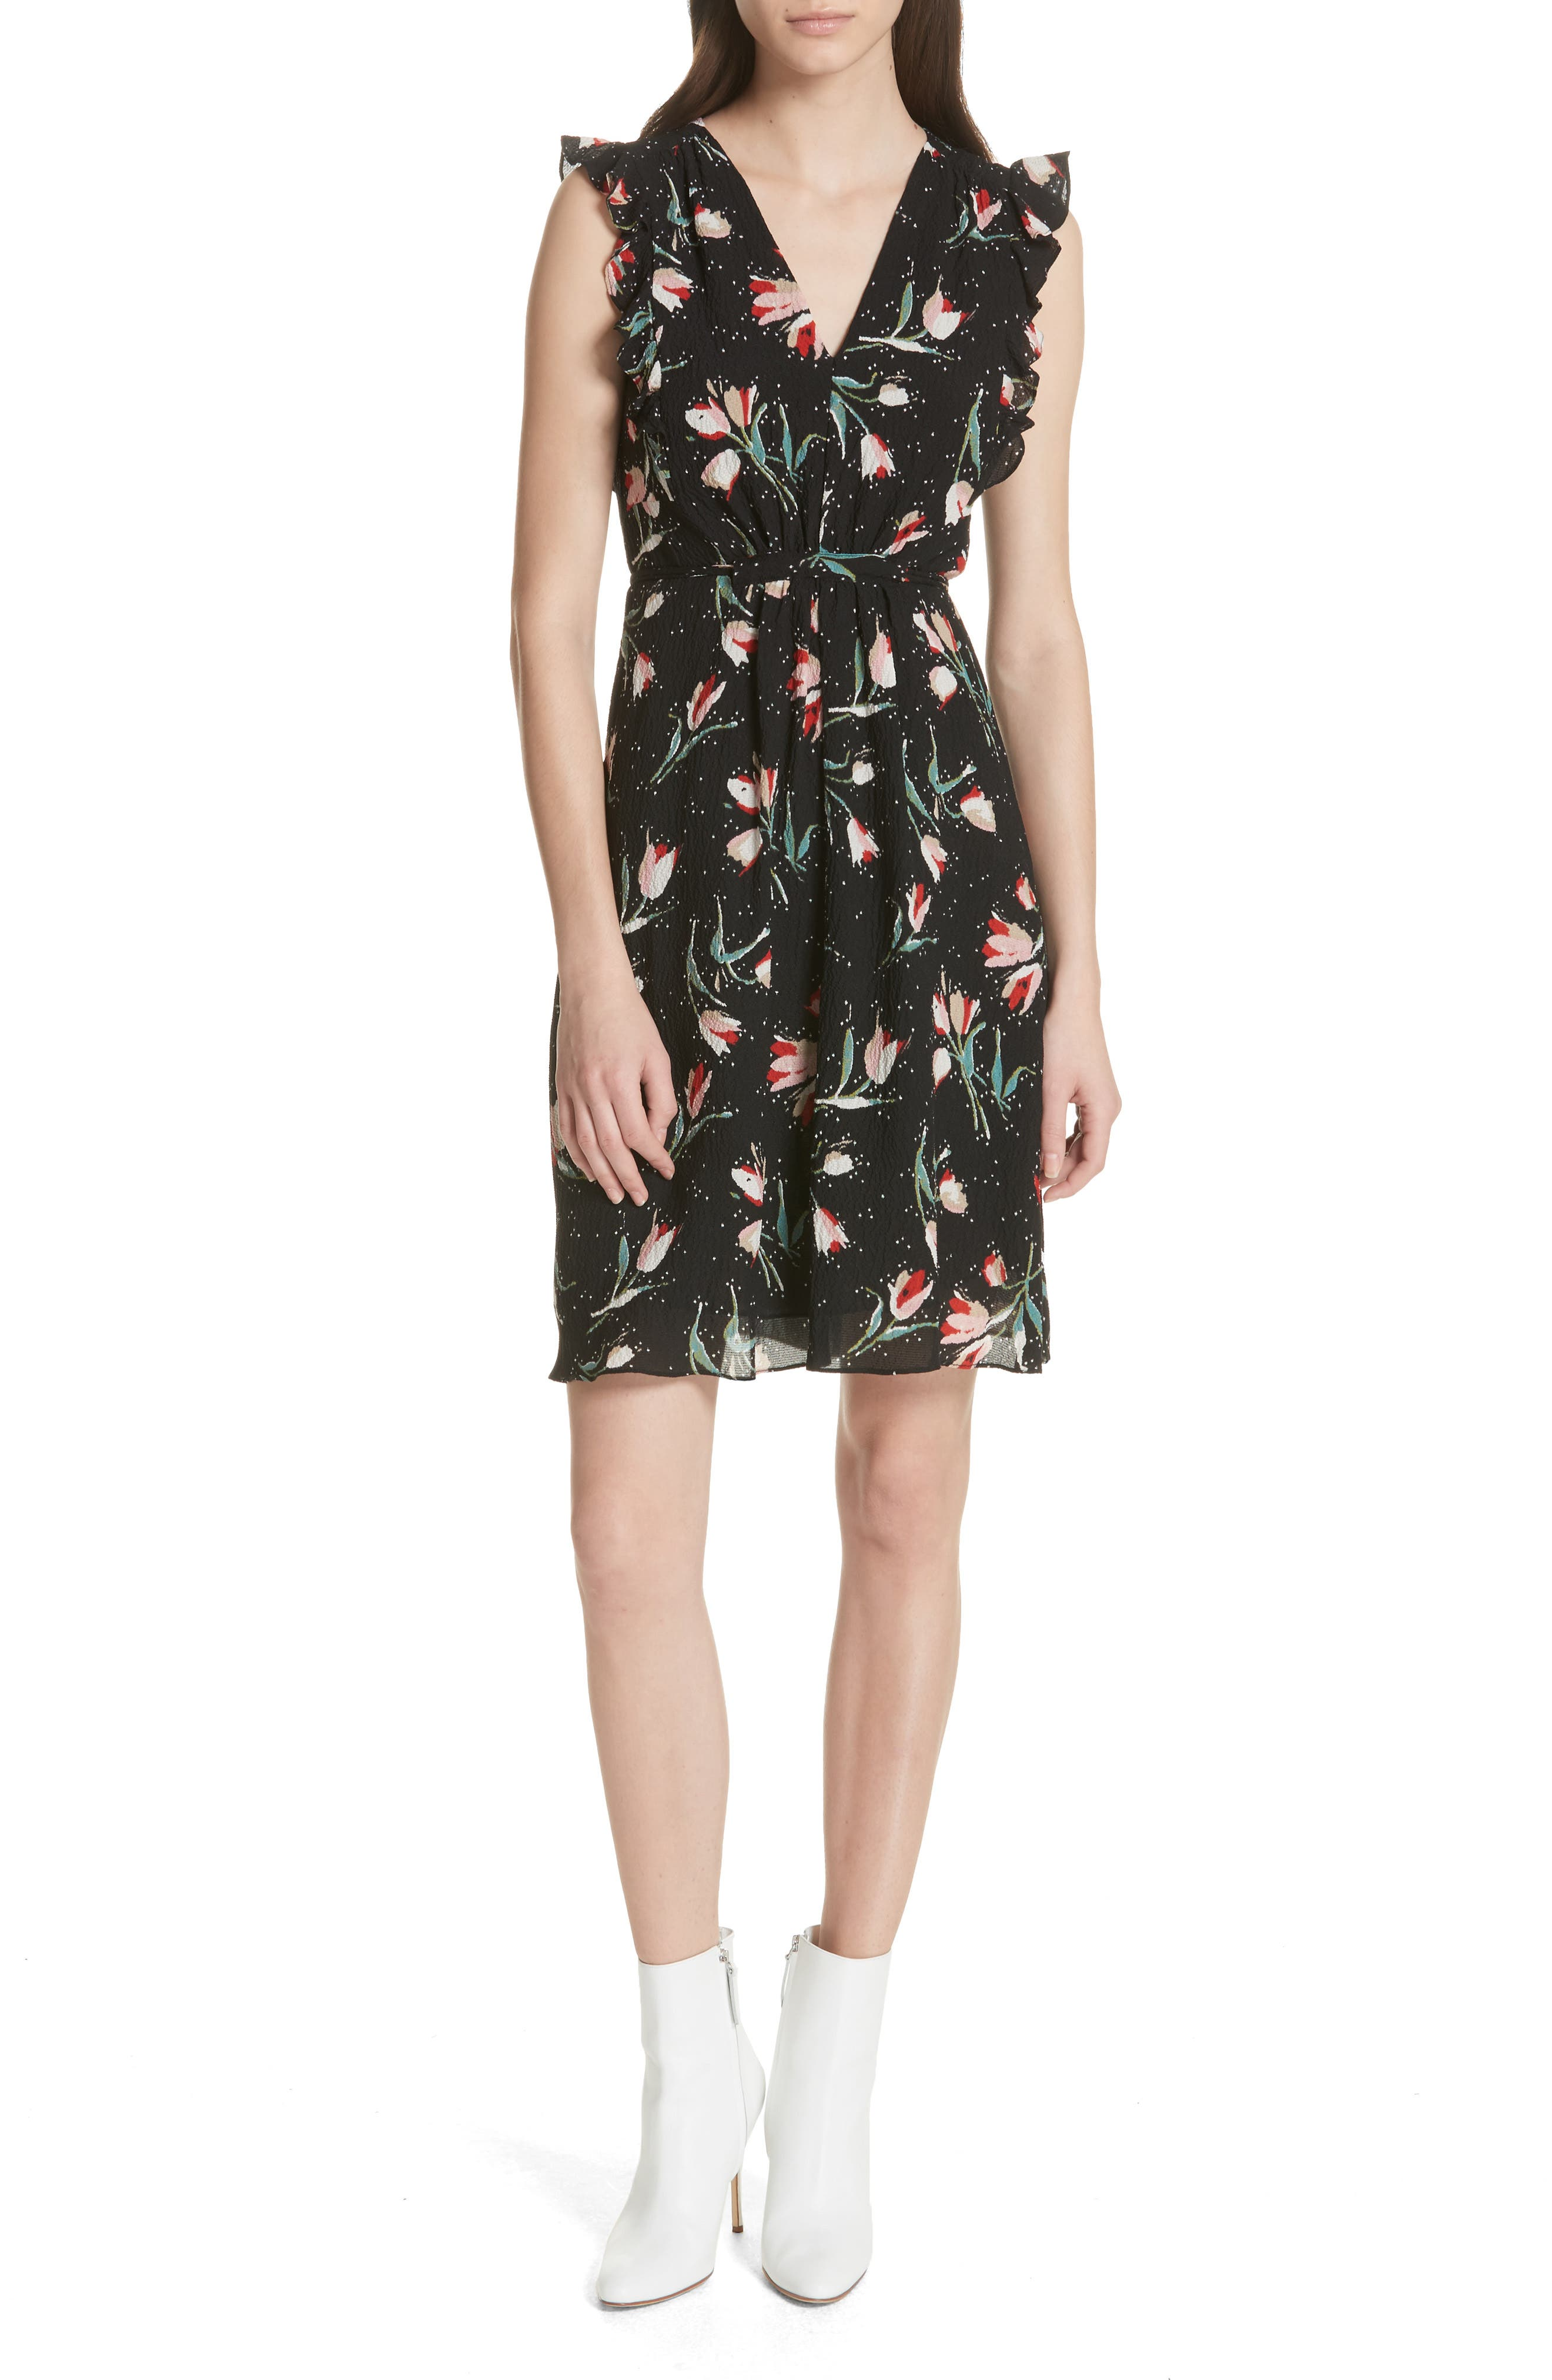 Alternate Image 1 Selected - Rebecca Taylor Ruffled Ikat Floral A-Line Dress